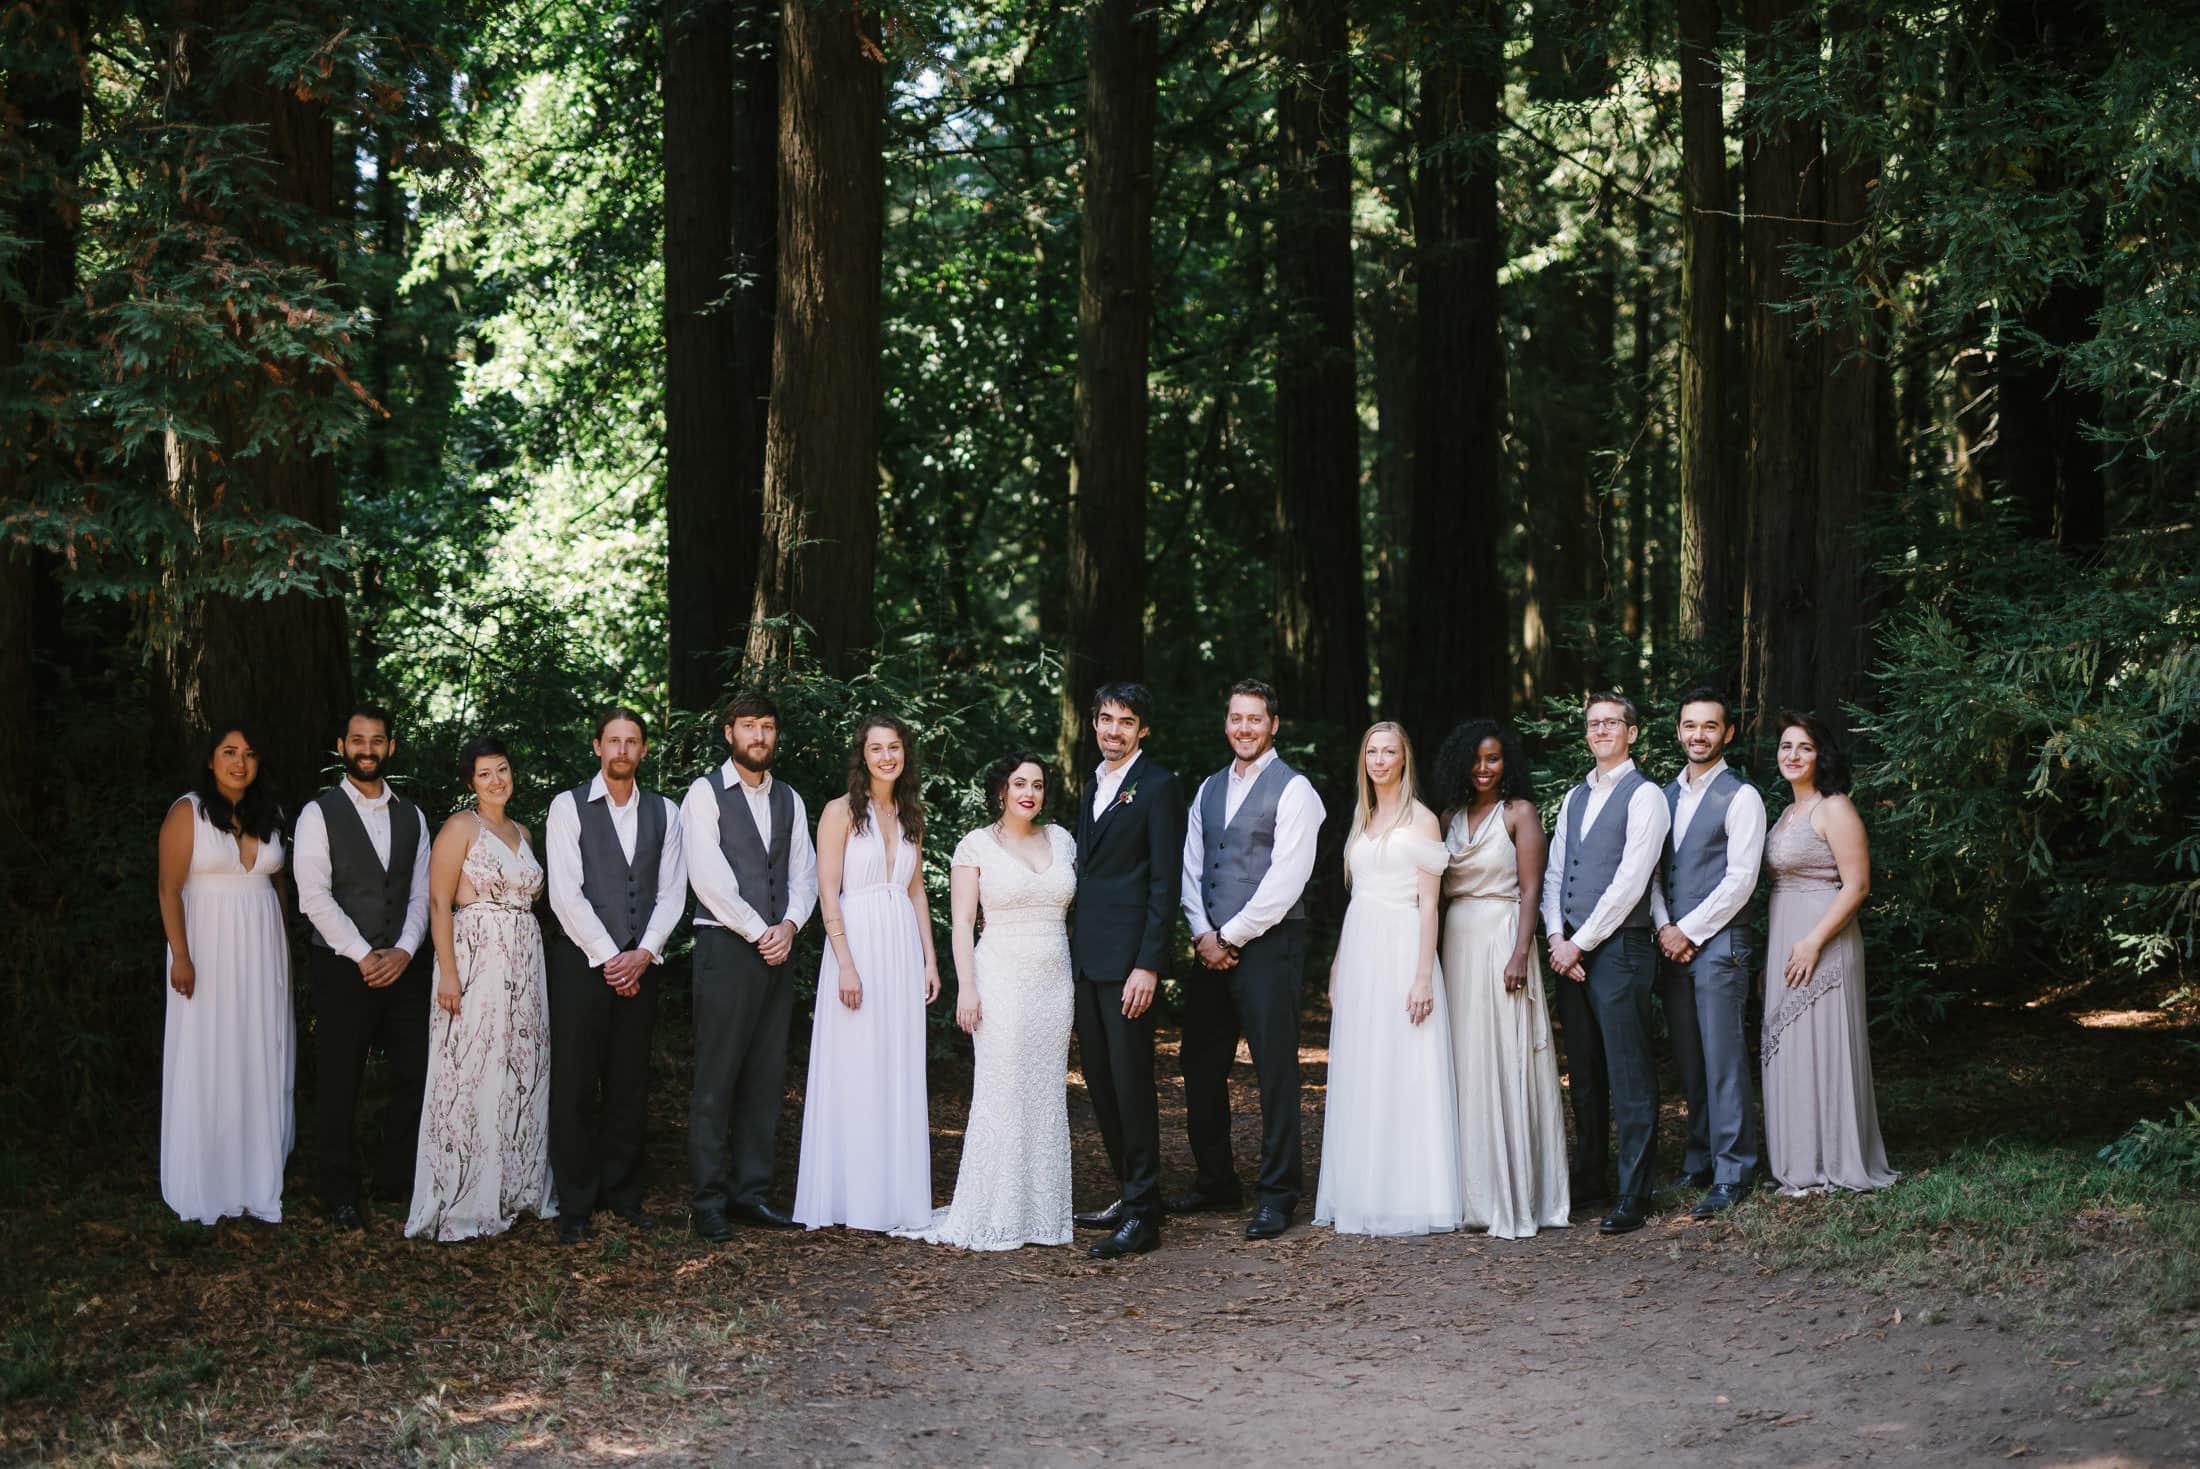 Robert's Regional Park wedding party portrait